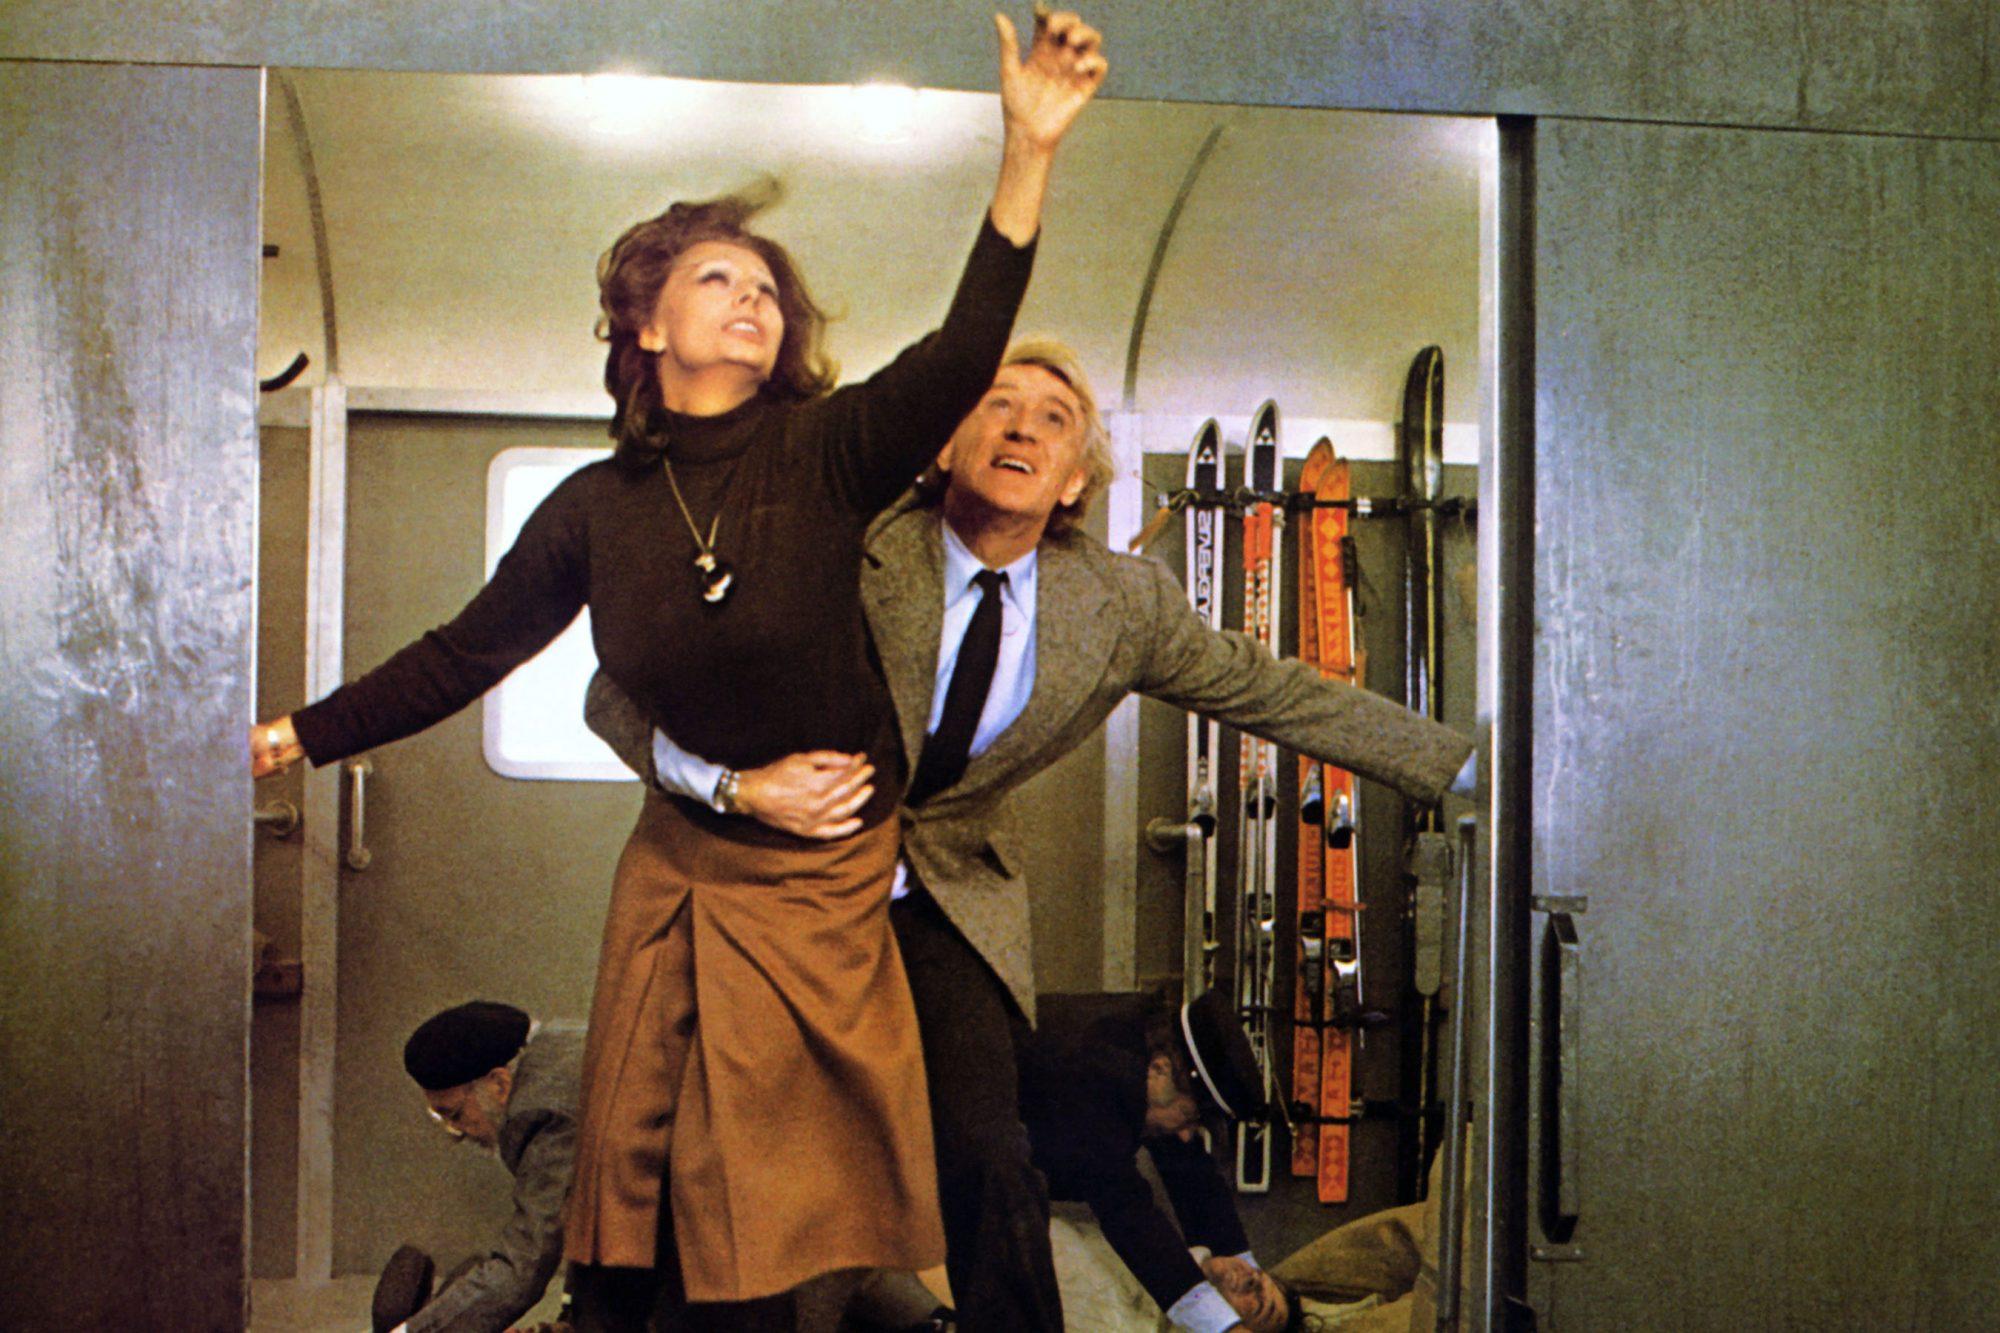 THE CASSANDRA CROSSING, fromleft: Sophia Loren, Richard Harris, 1976